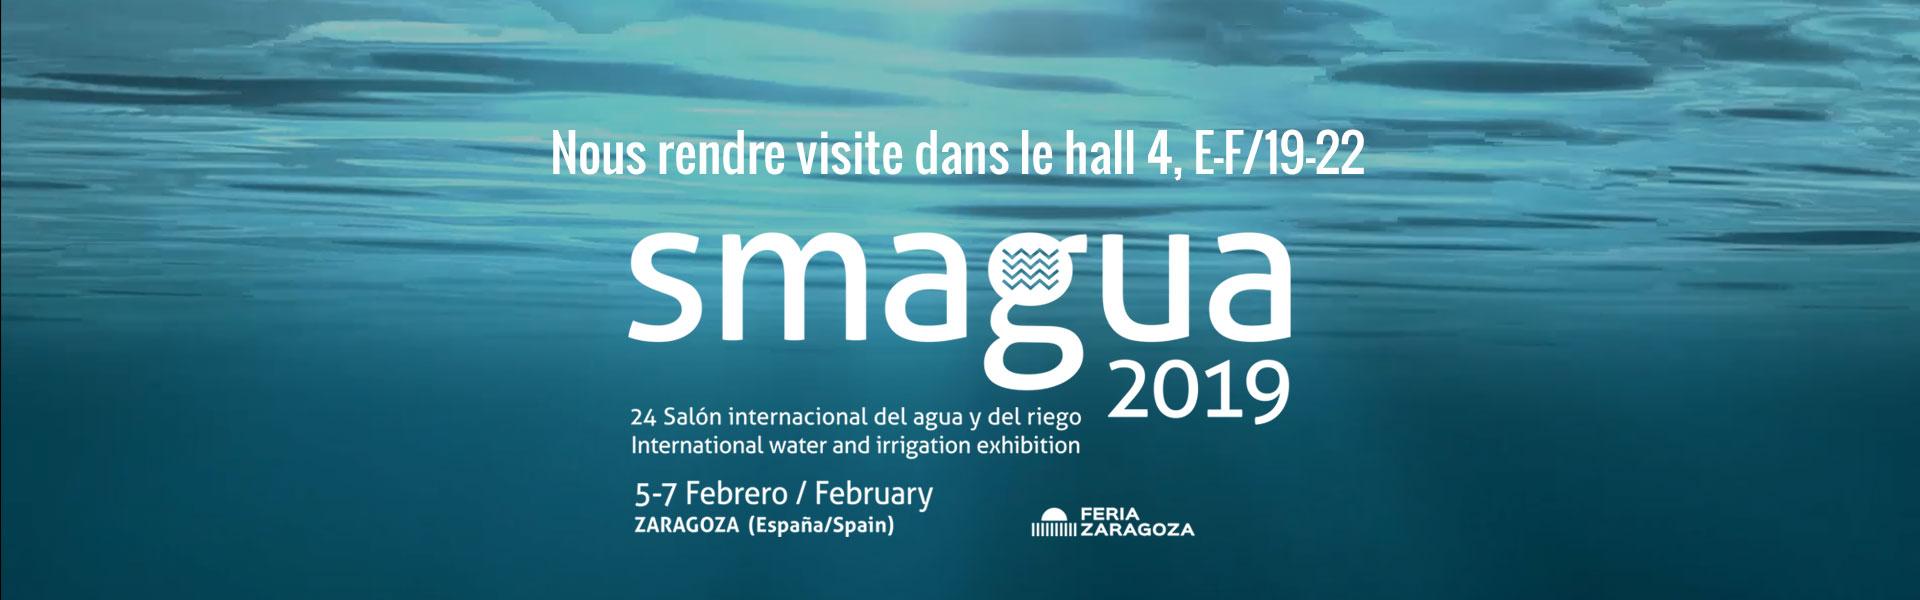 smagua2019-fr